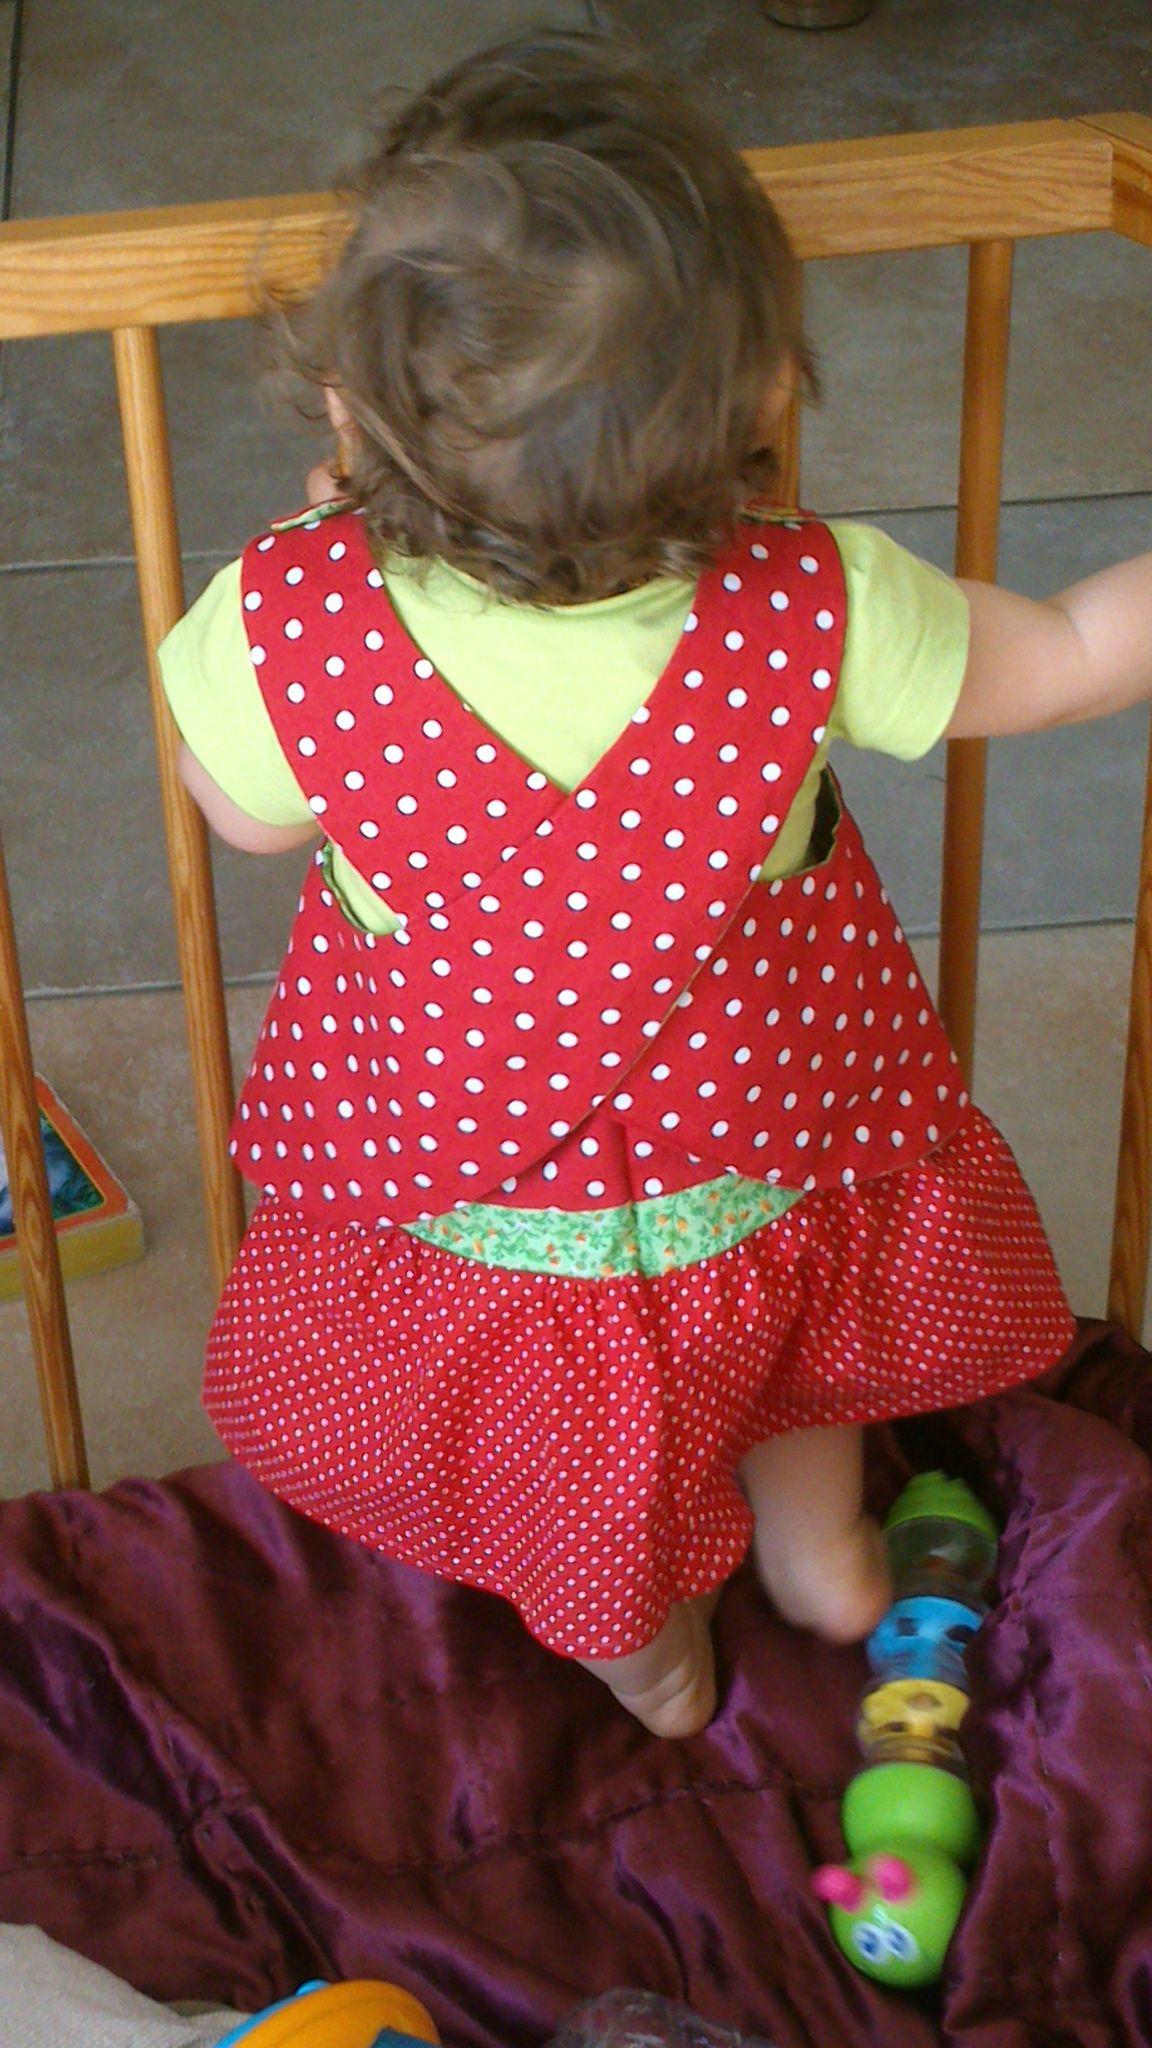 La petite jupe rouge